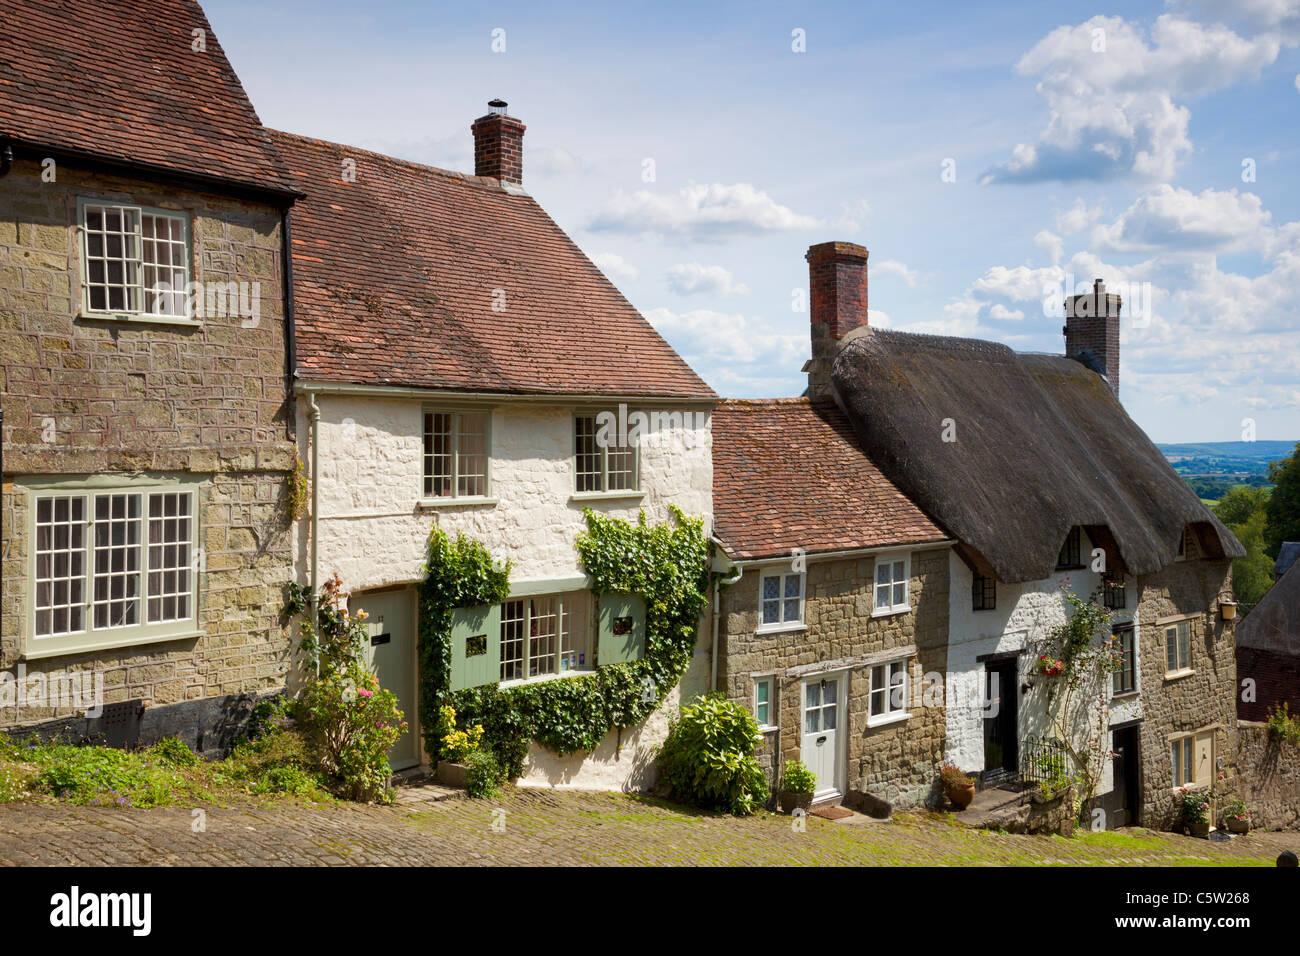 Gold Hill  Shaftesbury, Dorset, England  UK GB EU Europe - Stock Image